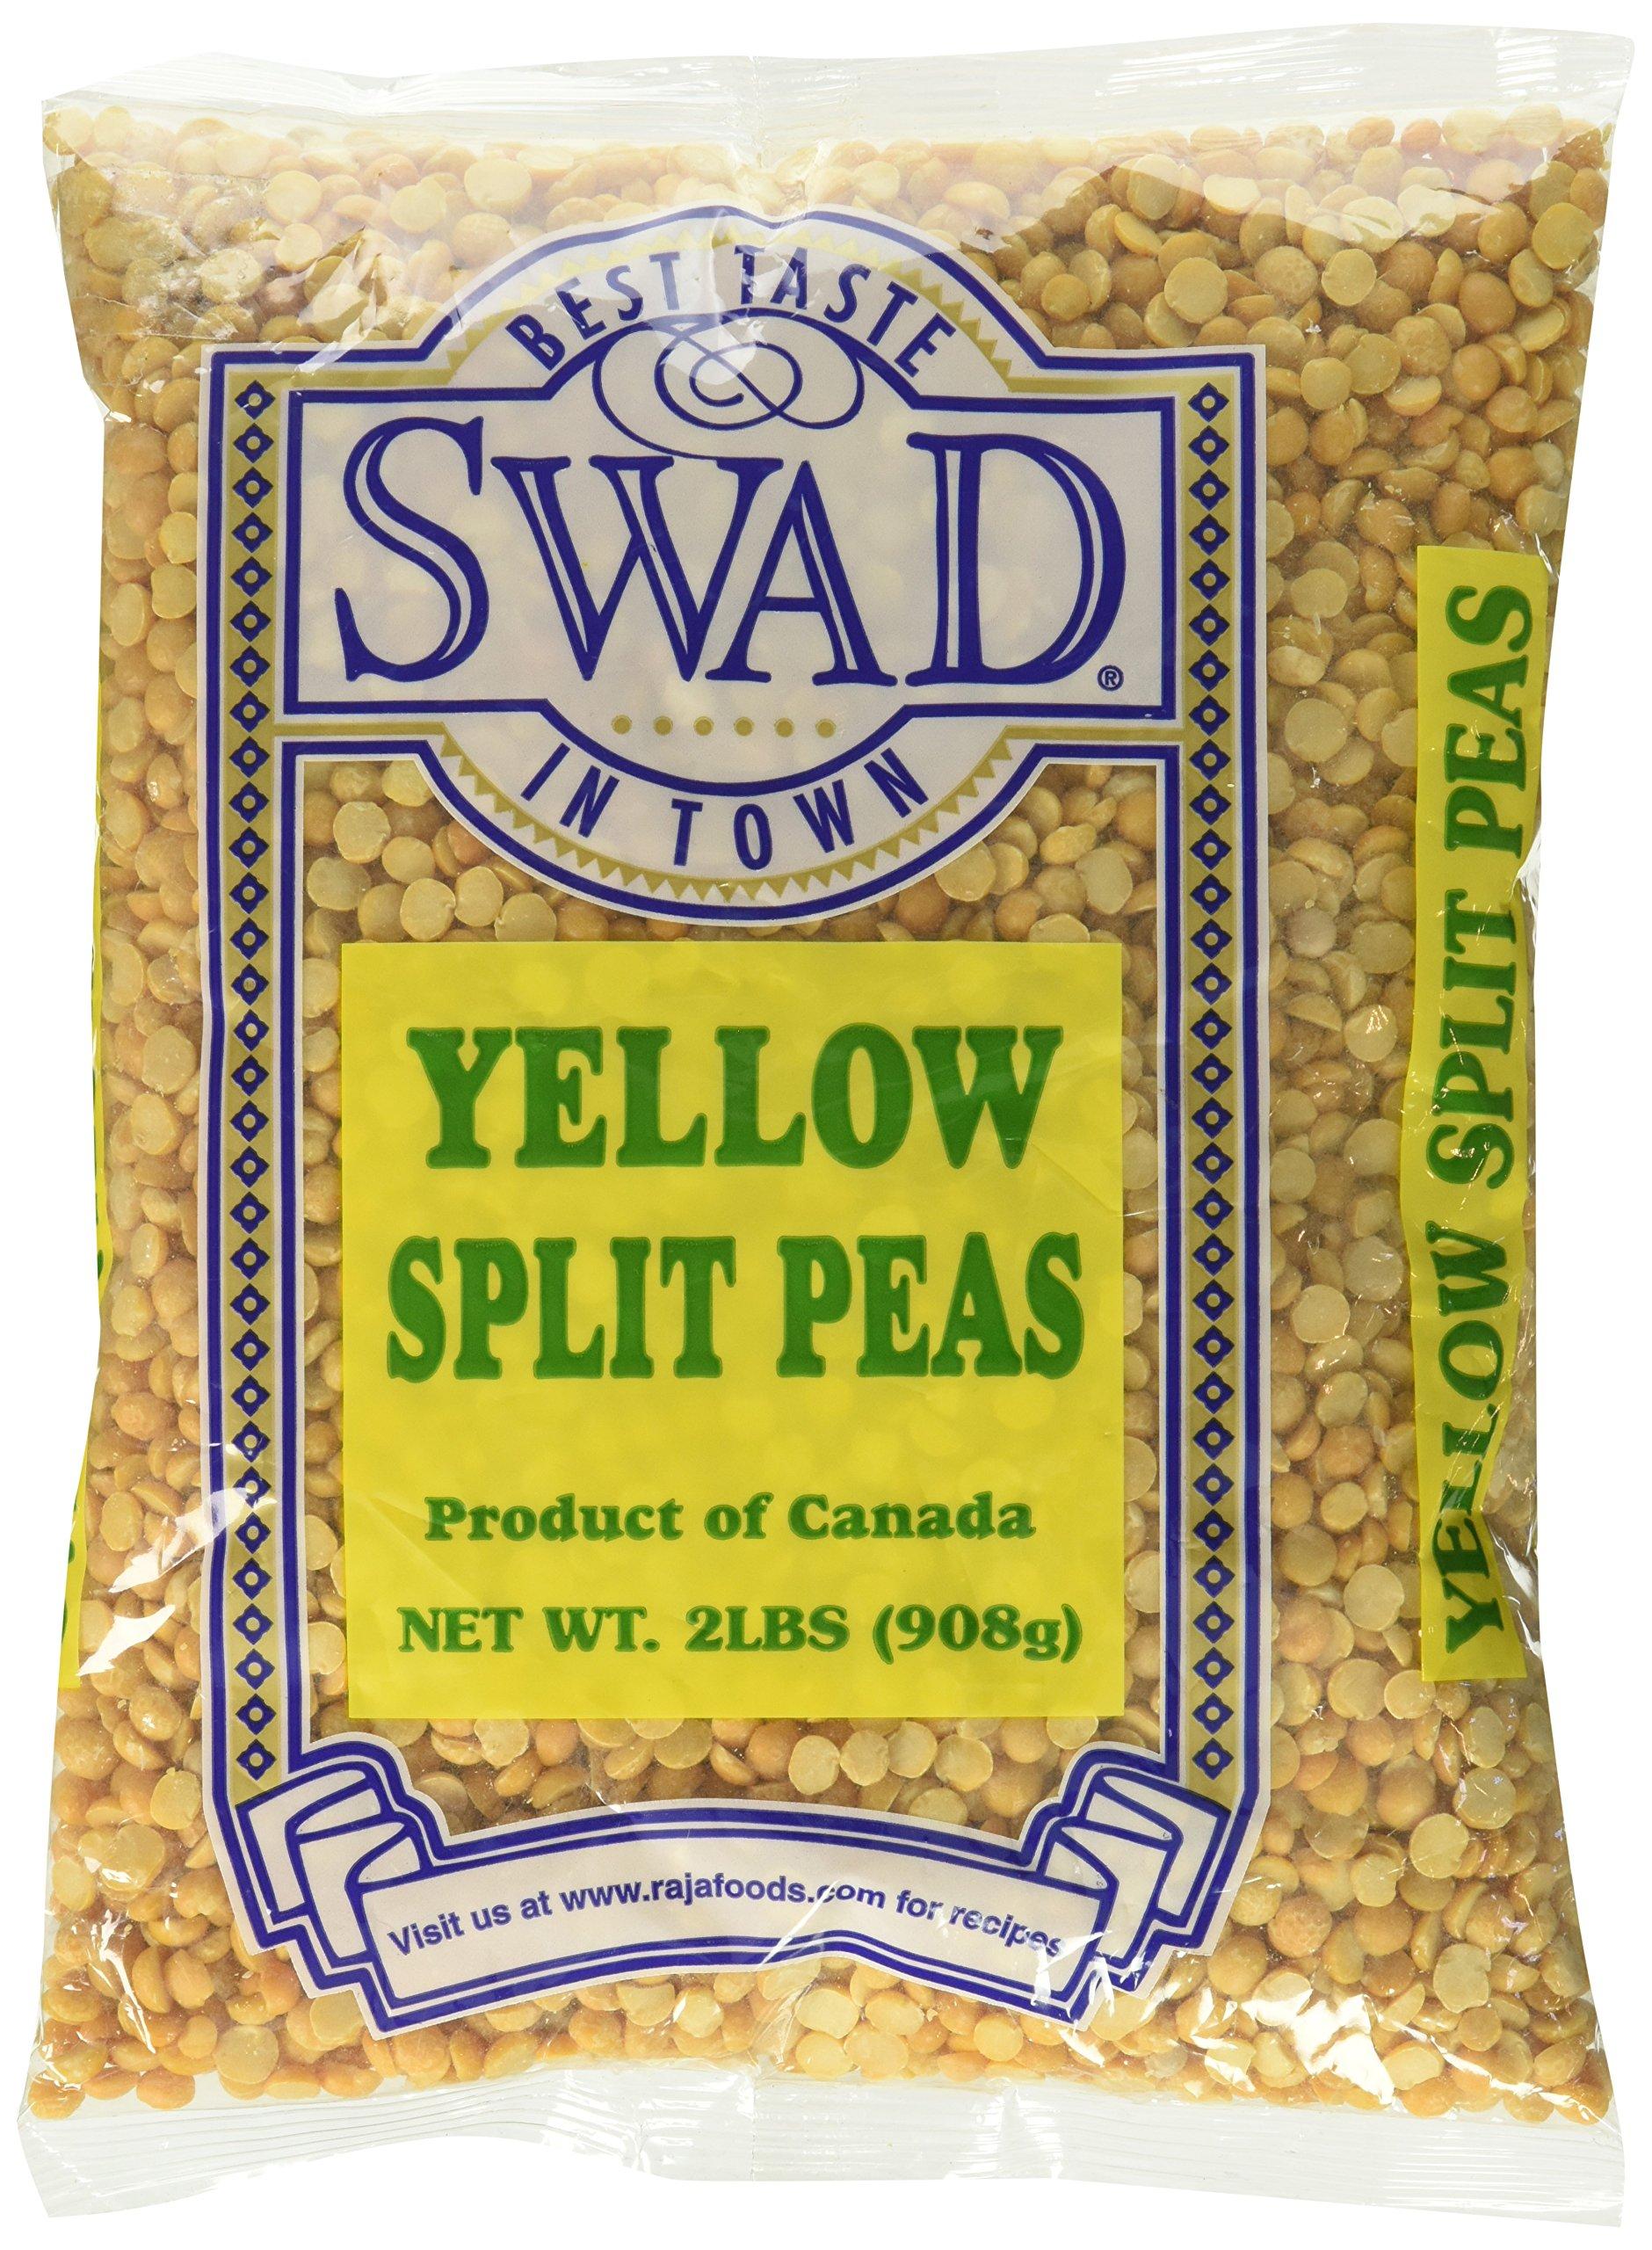 Great Bazaar Swad Split Peas, Yellow, 2 Pound